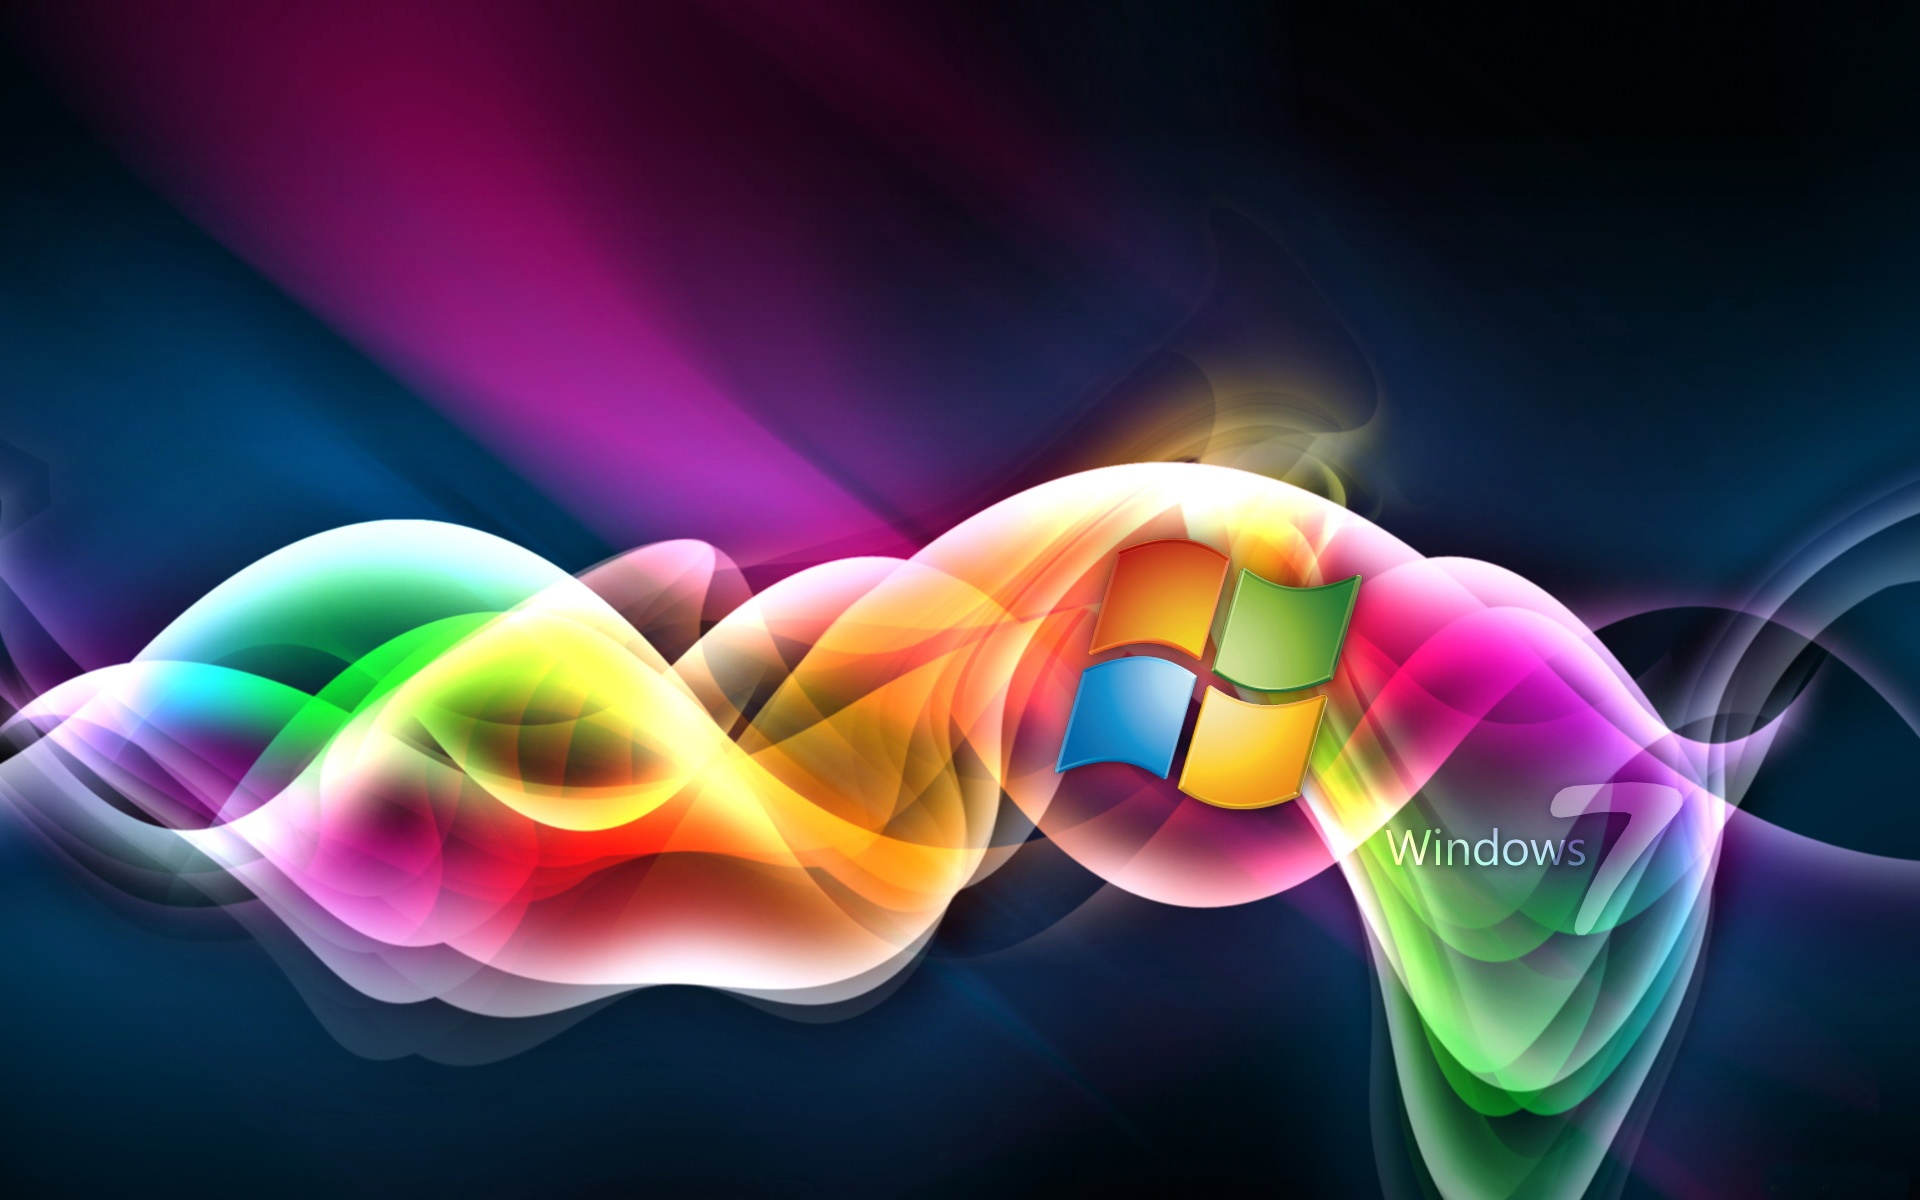 3D Windows 10 Wallpaper WallpaperSafari   Wallpaper 1920x1200